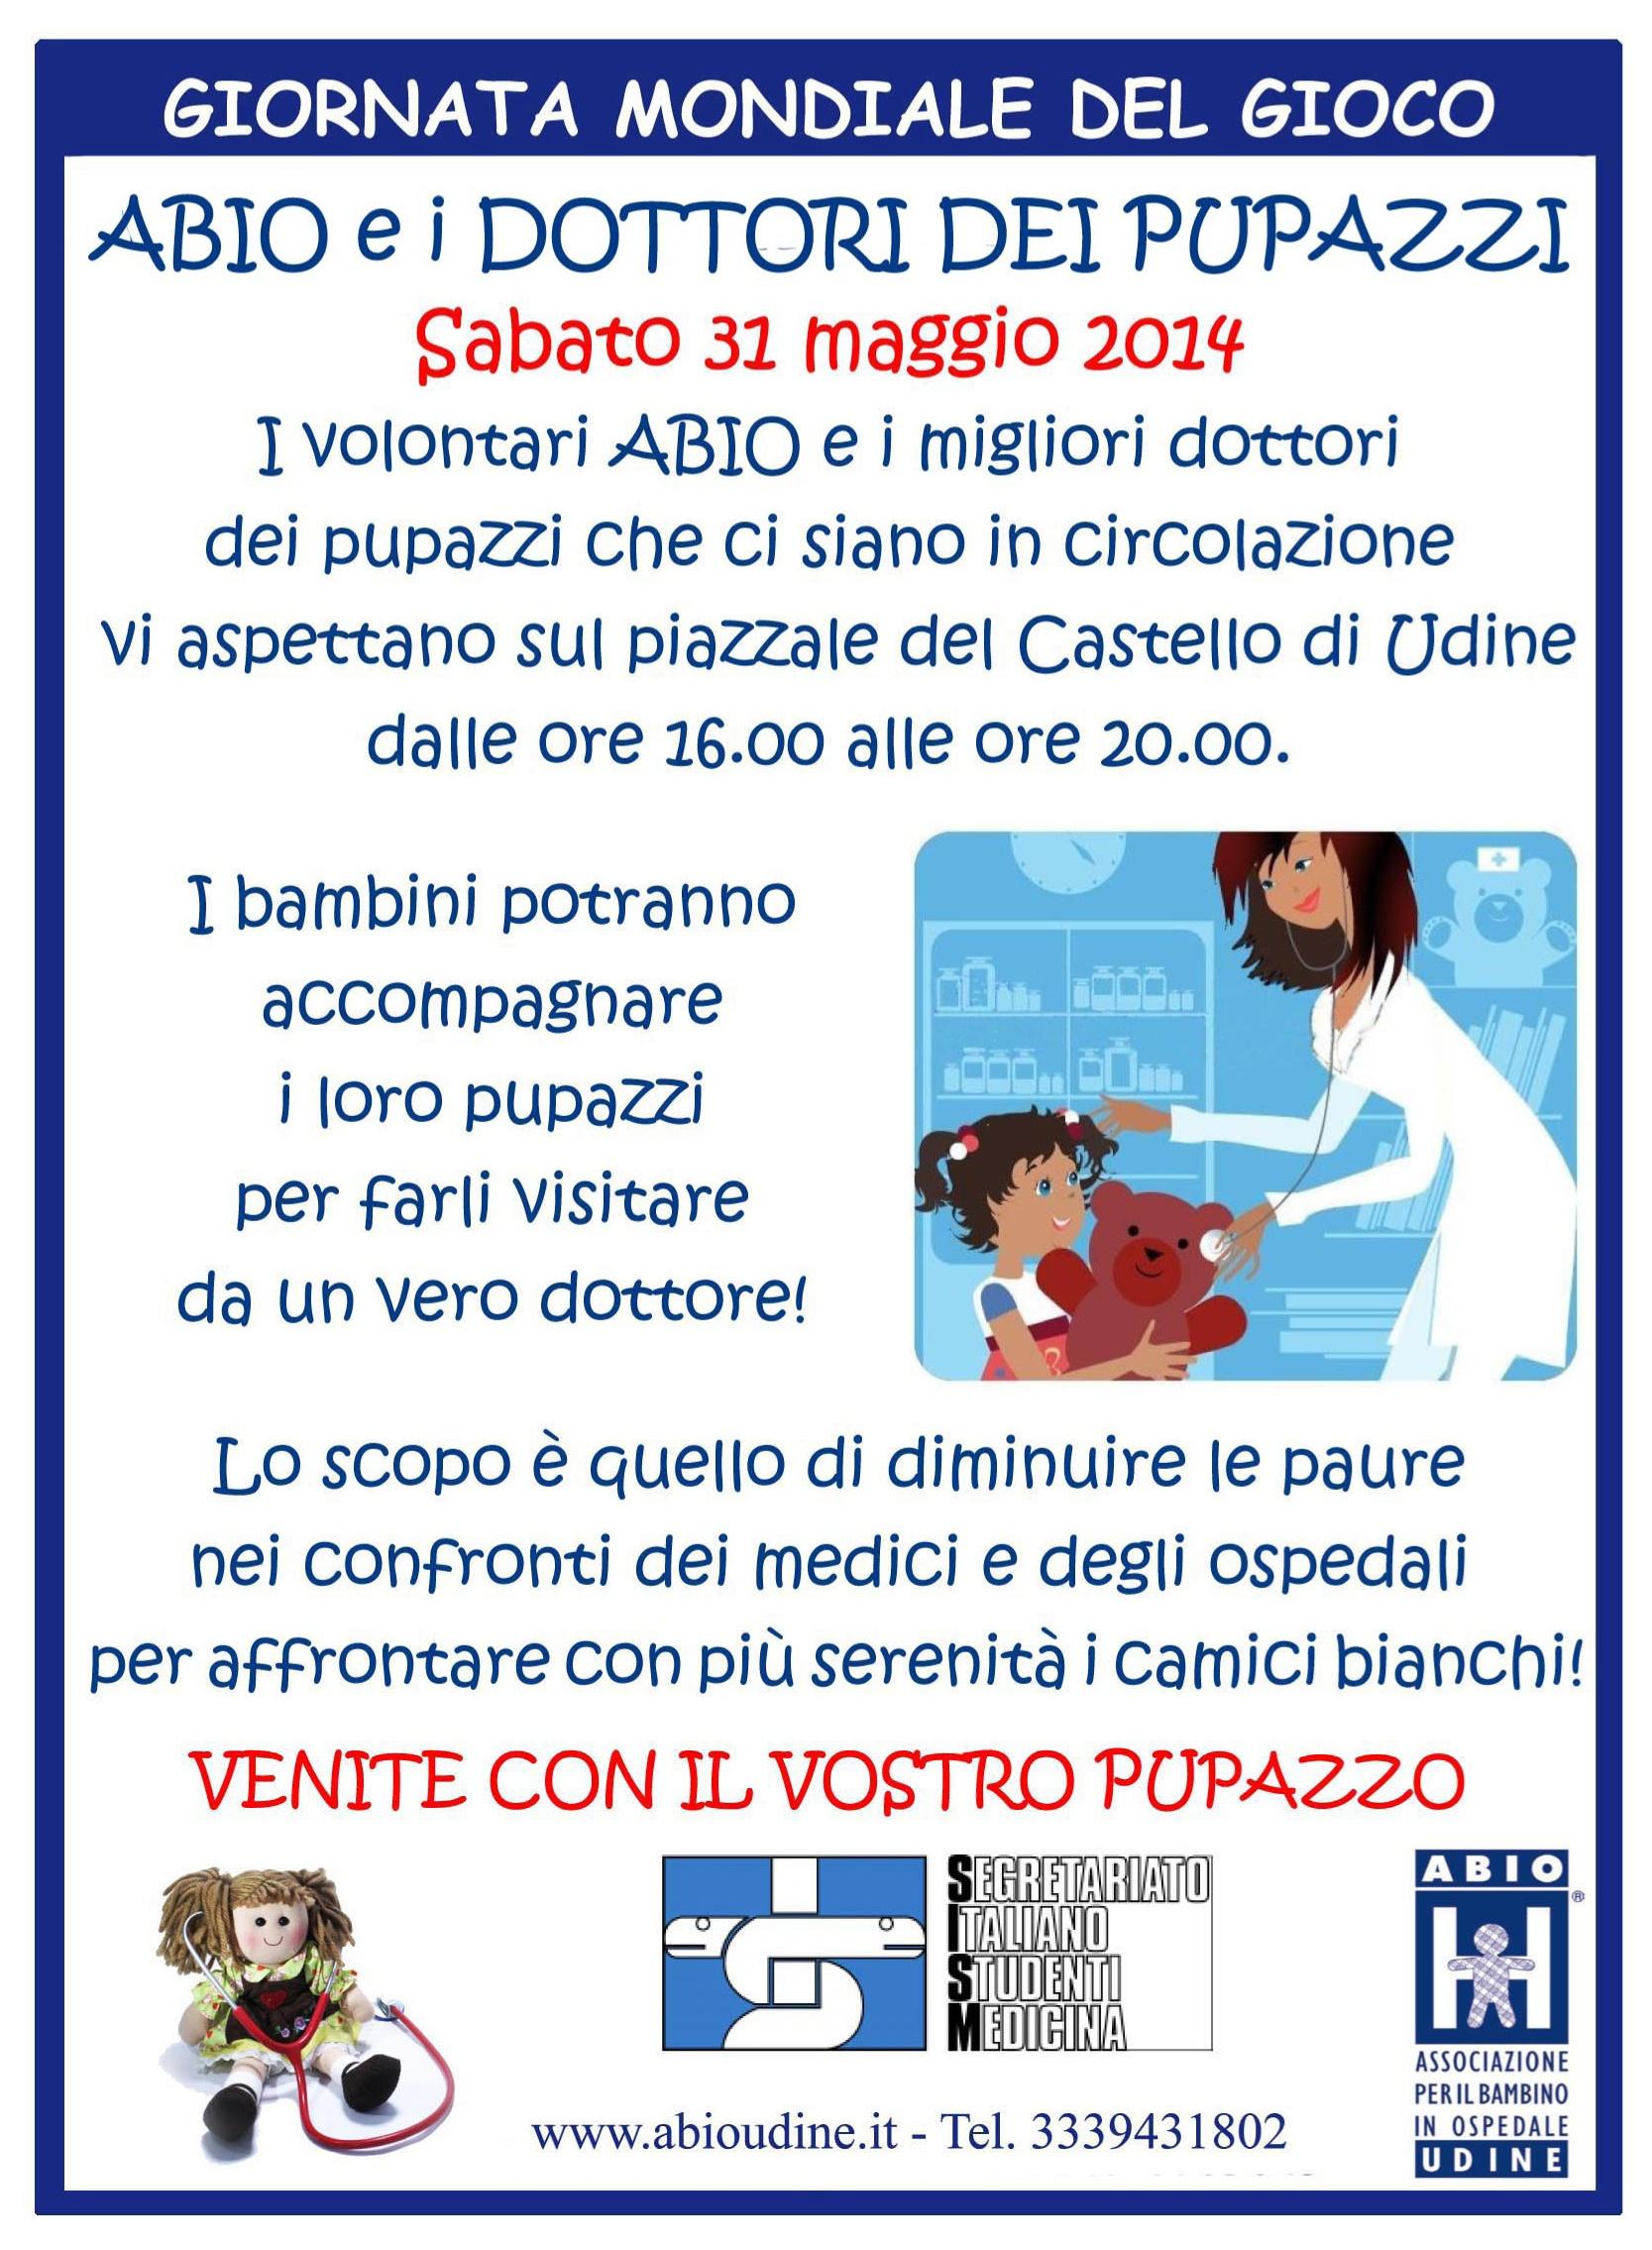 LOCANDINA-ospedale-pupazzi[1]